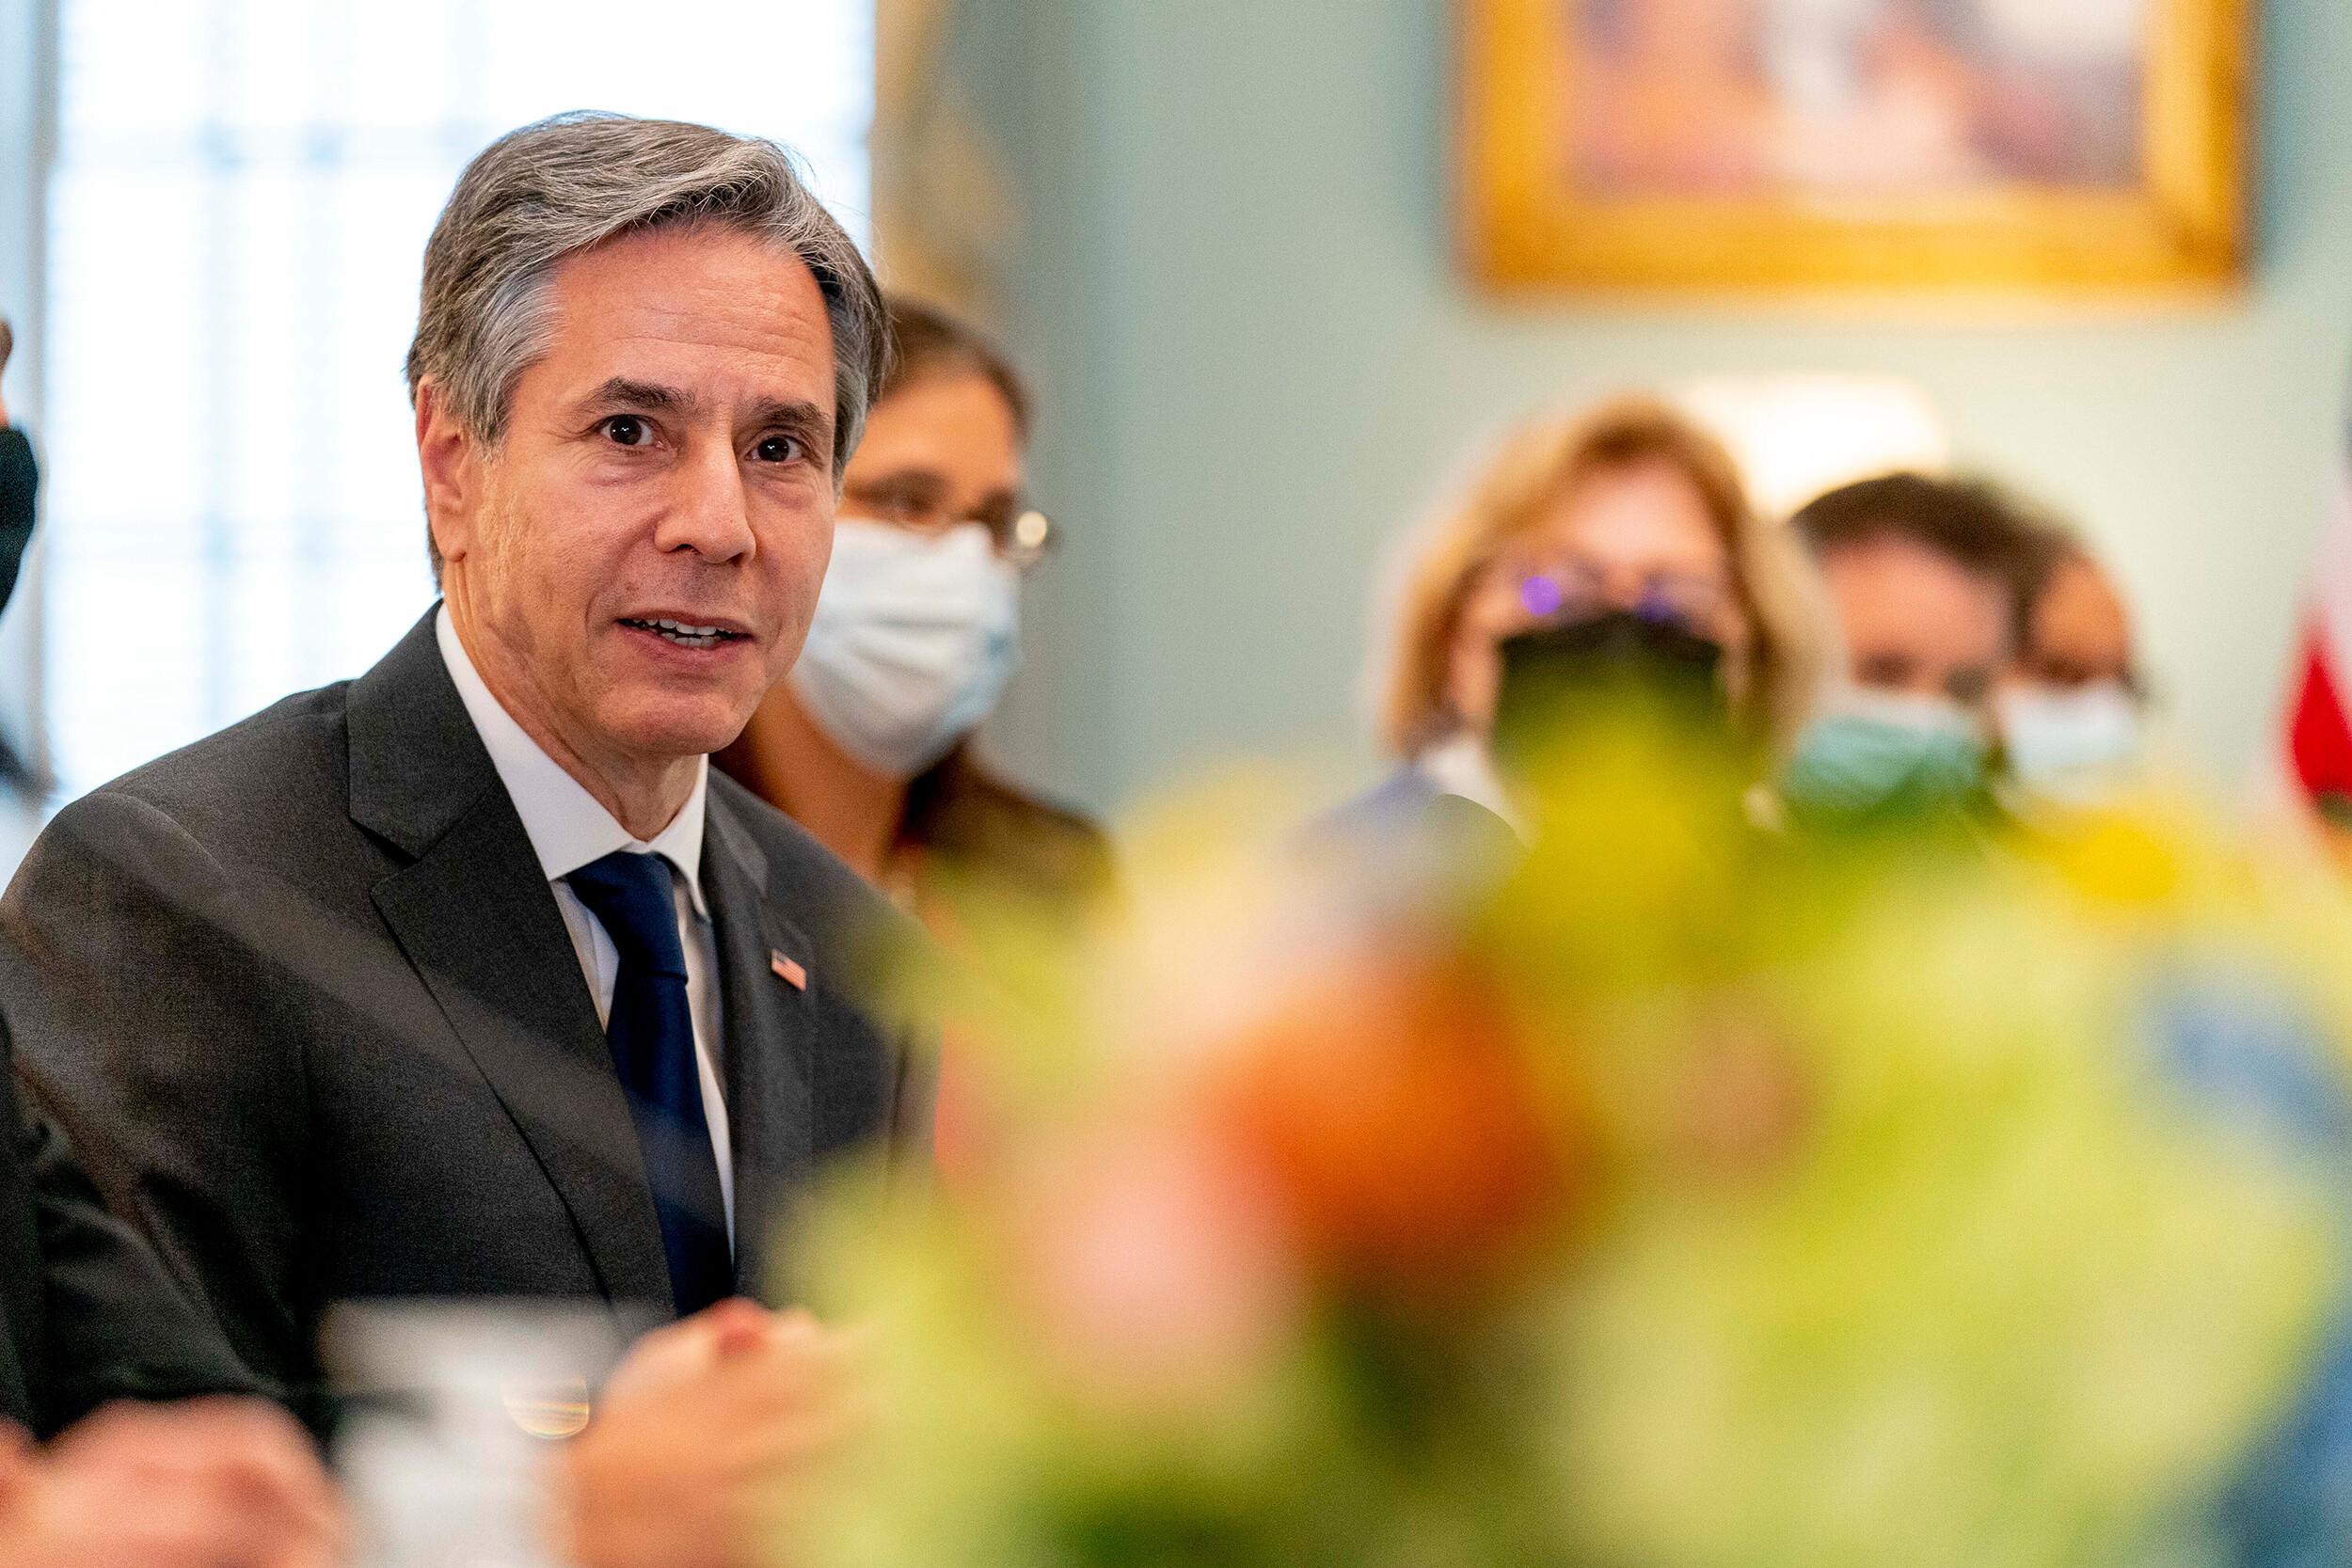 Blinken met with diplomats impacted by Havana syndrome in Bogotá